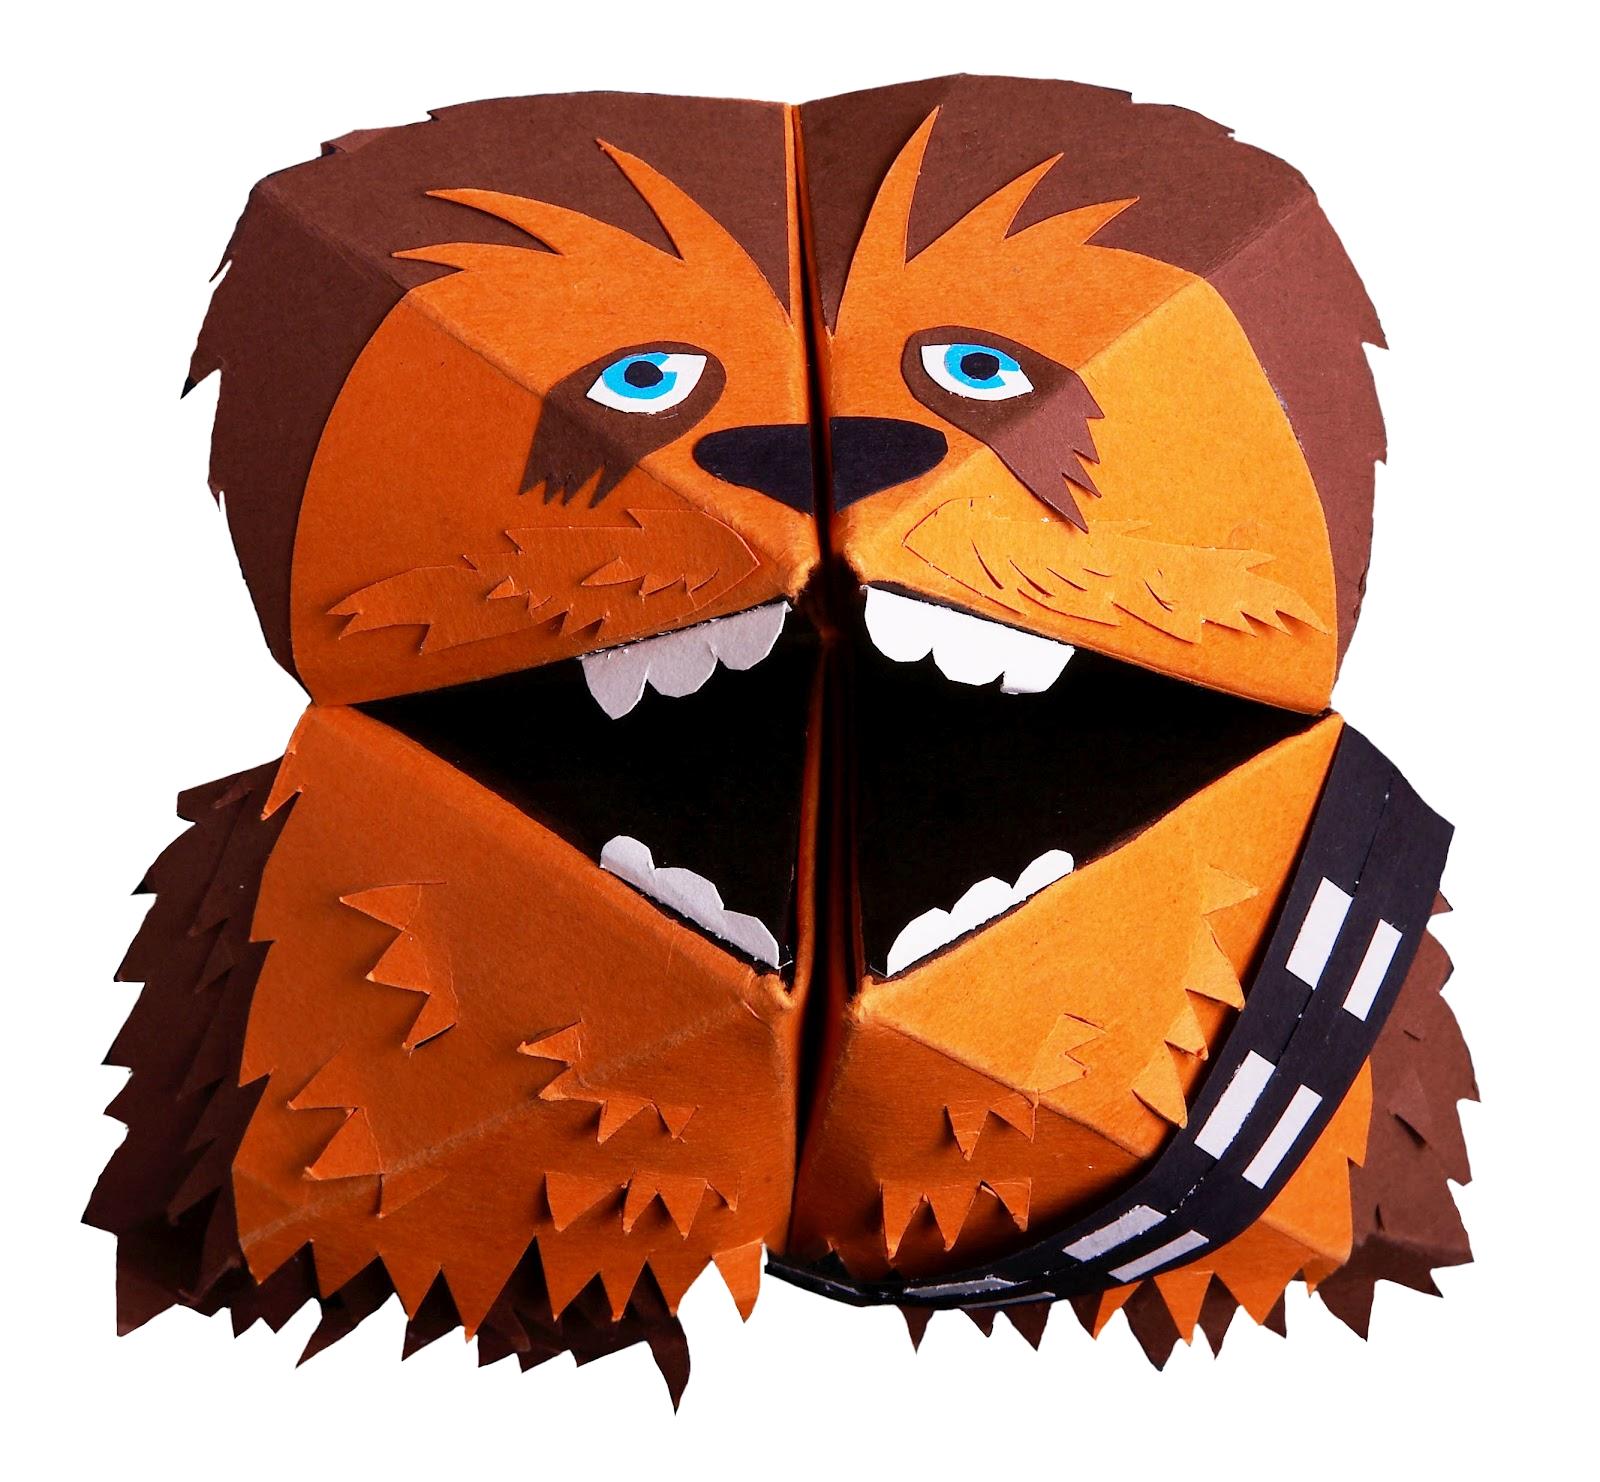 Fortune Wookiee | Puffleville Wiki | FANDOM powered by Wikia - photo#35